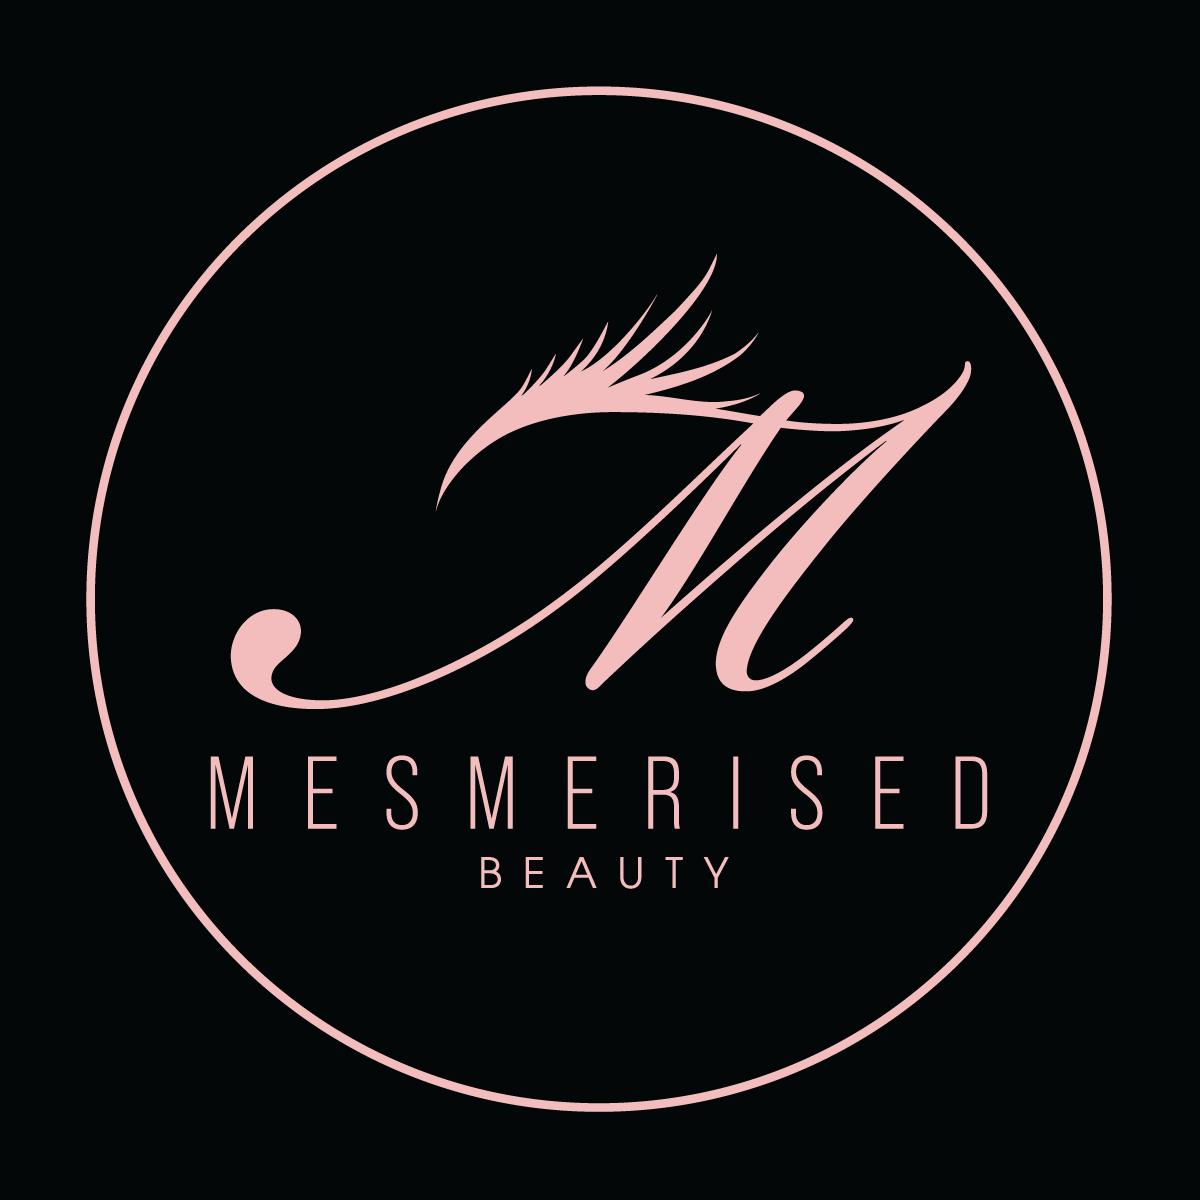 Mesmerised Beauty